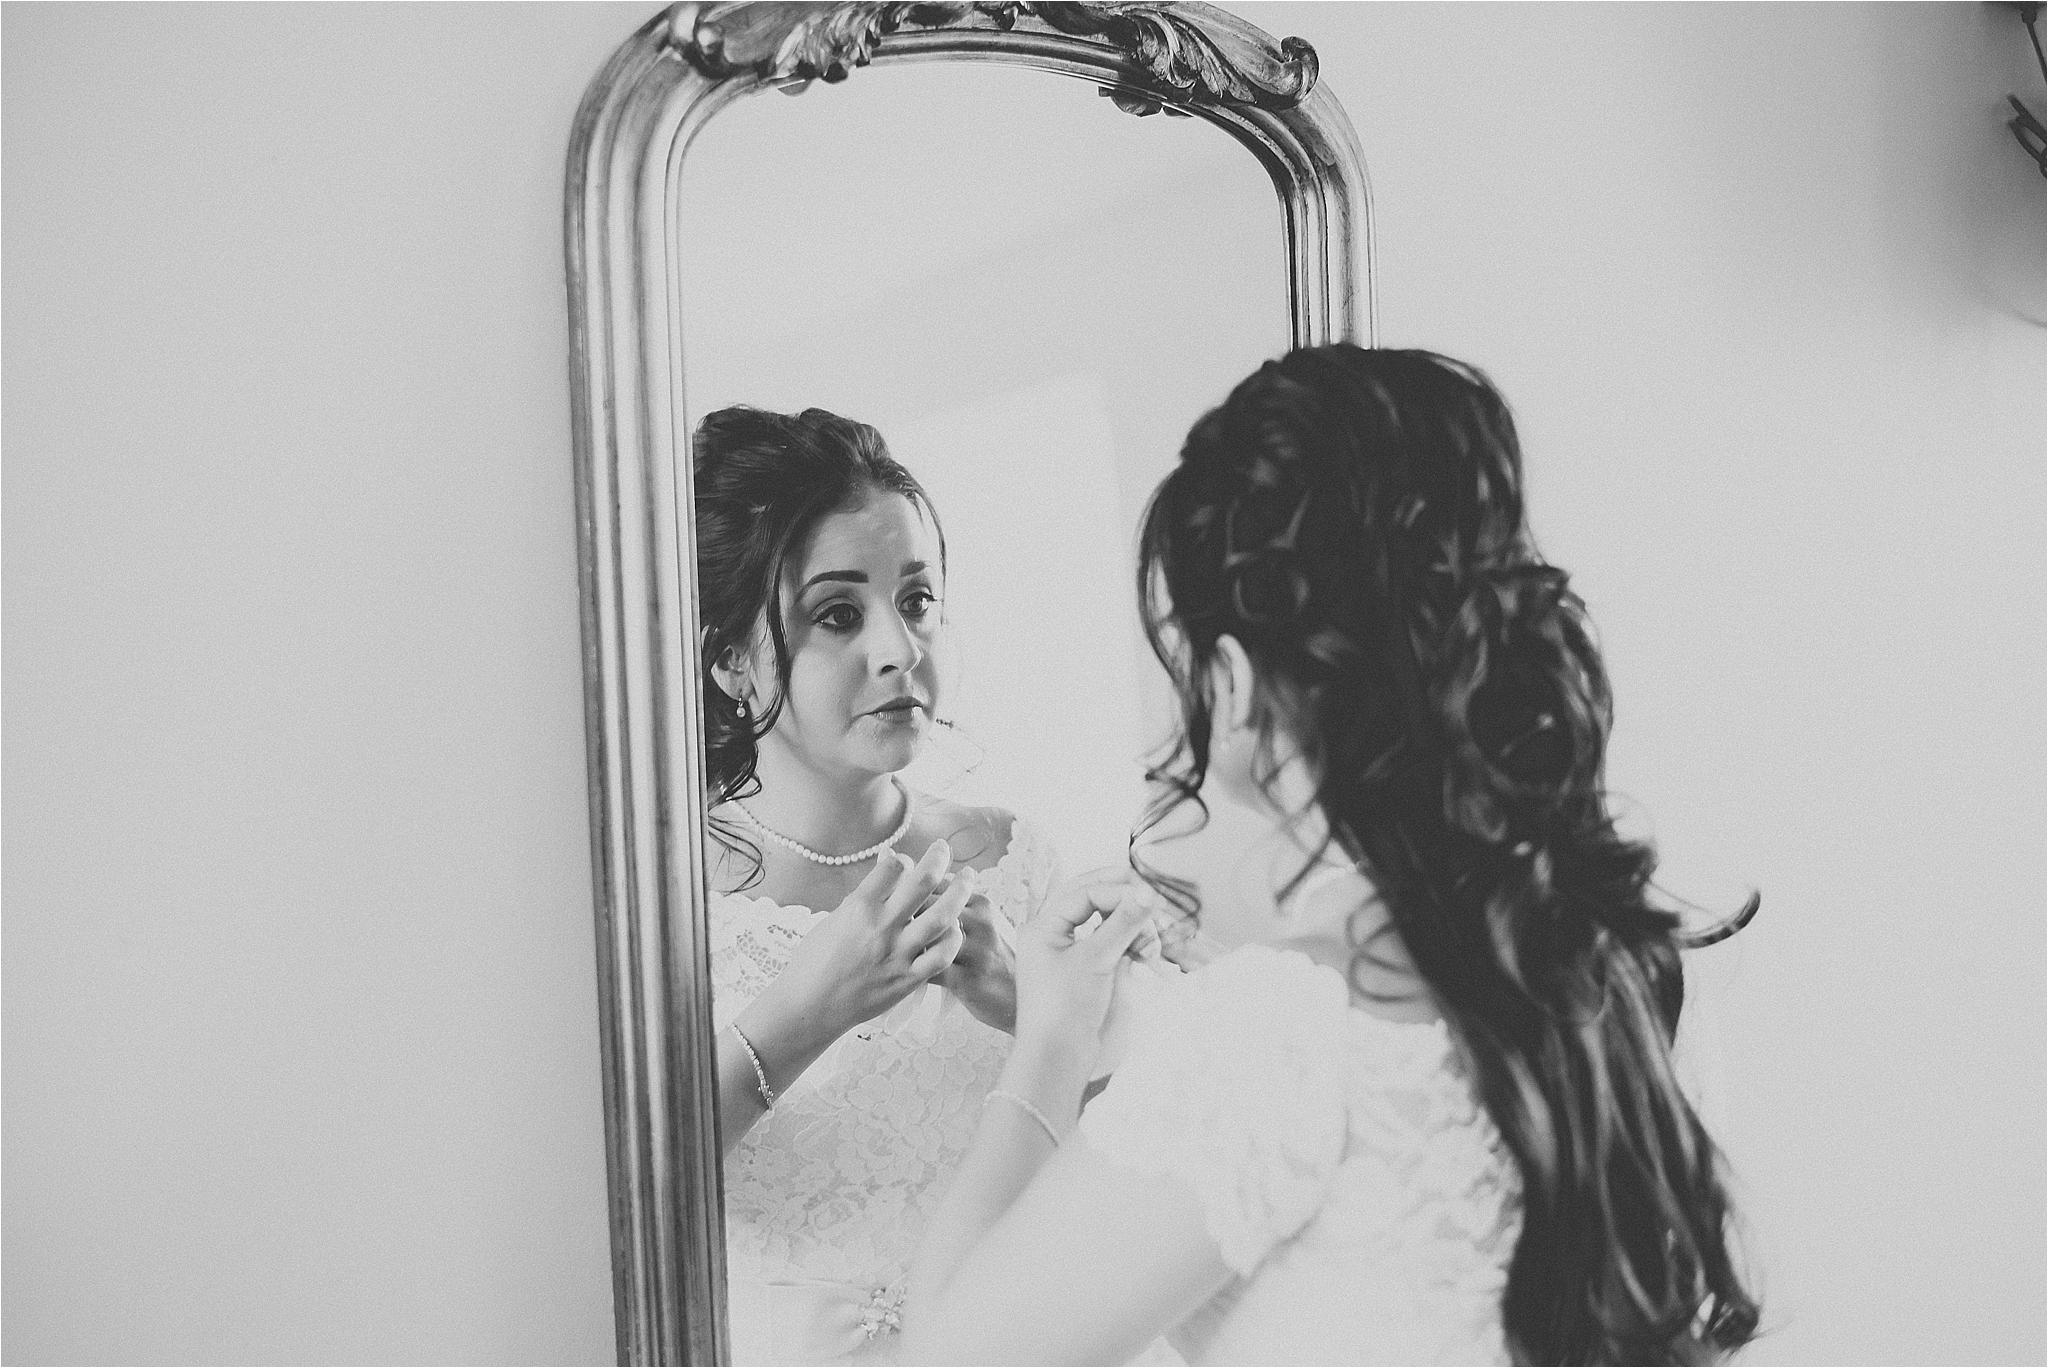 thevilla+lancashire+wreagreen+wedding+photographer16.jpg